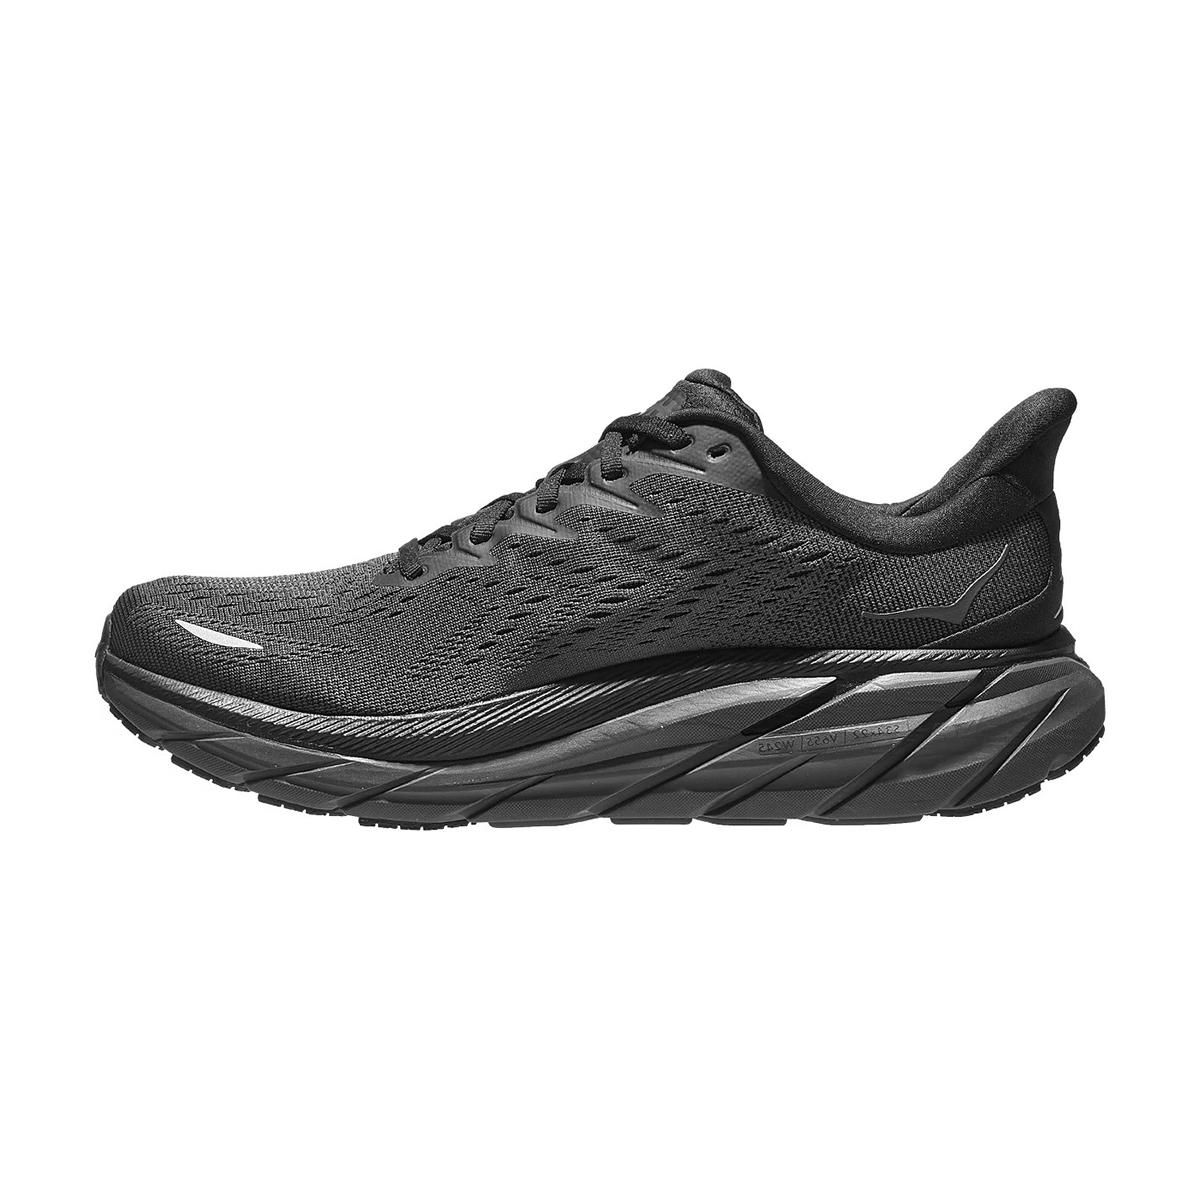 Men's Hoka One One Clifton 8 Running Shoe - Color: Black / Black - Size: 7 - Width: Regular, Black / Black, large, image 2